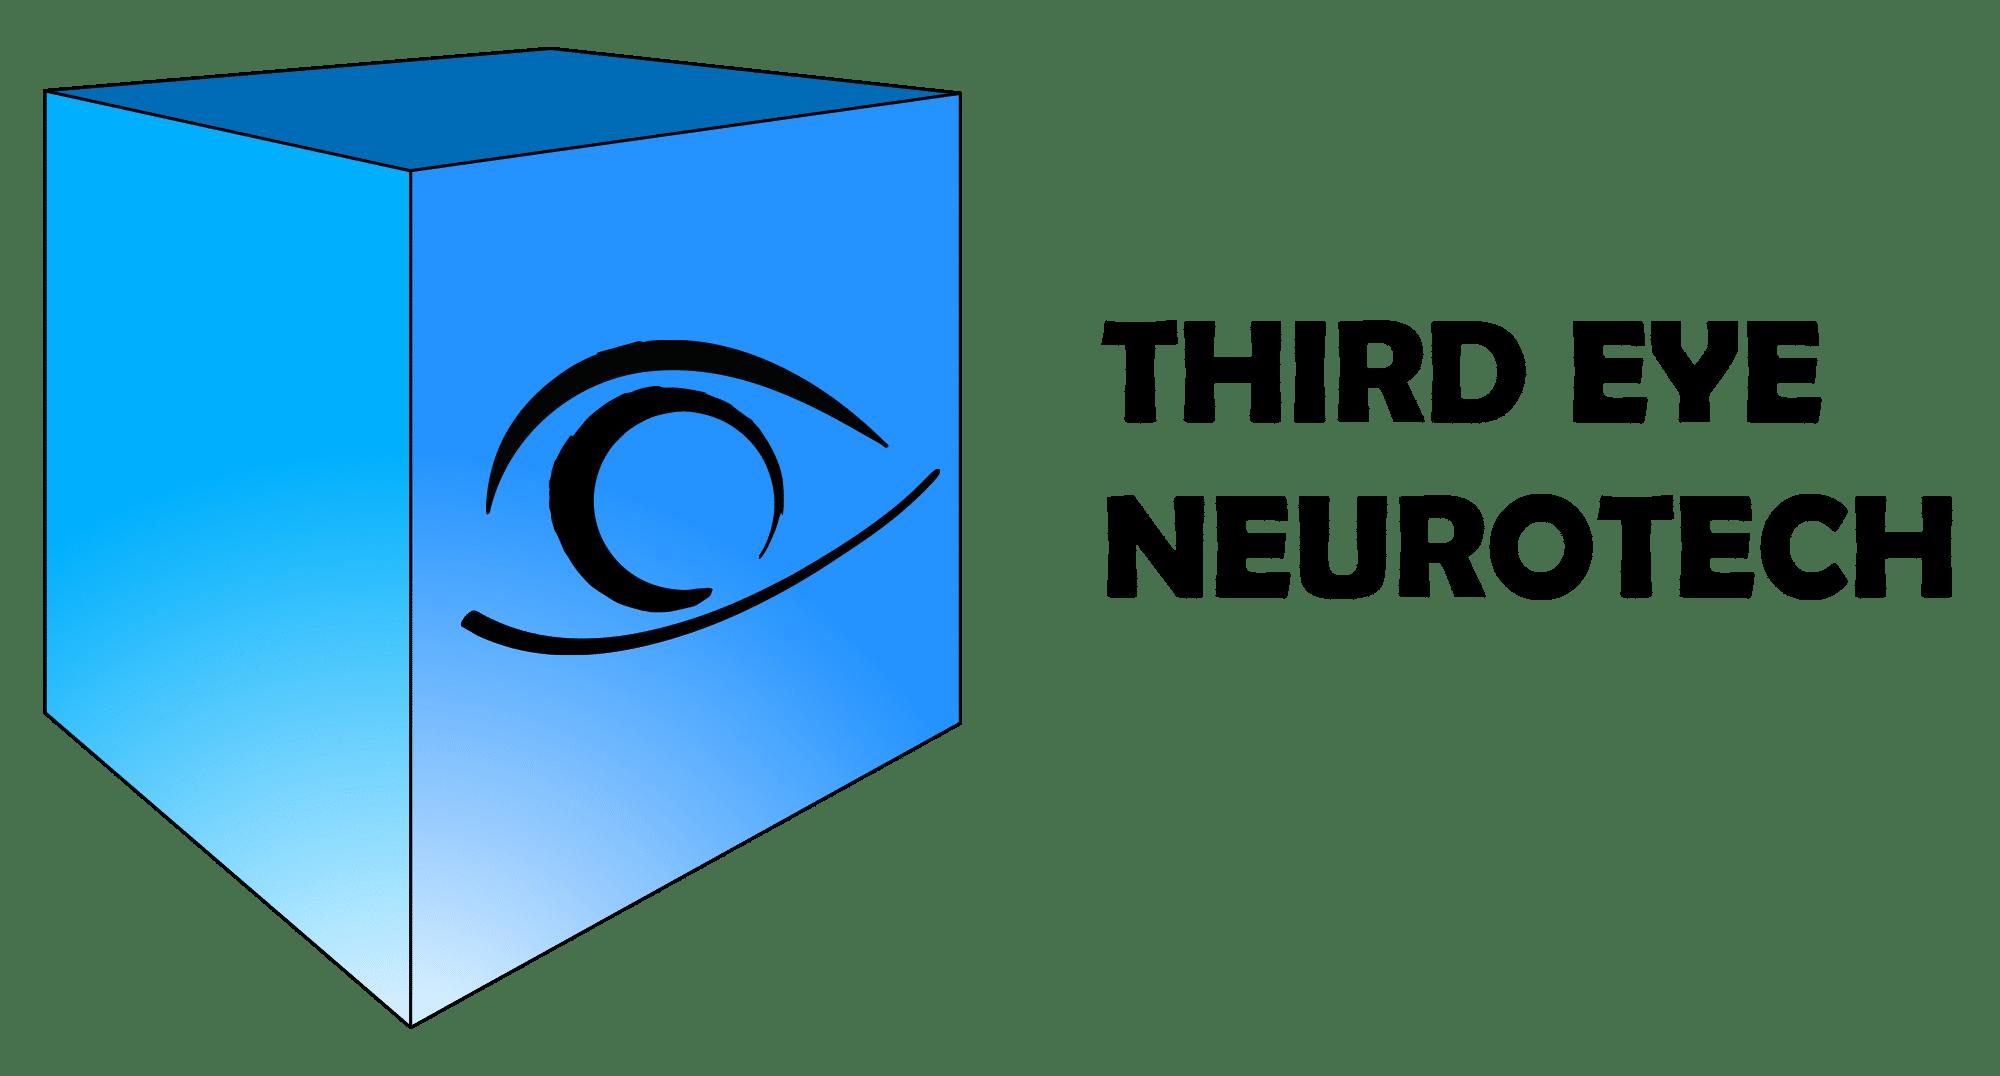 Third Eye Neurotech Logo